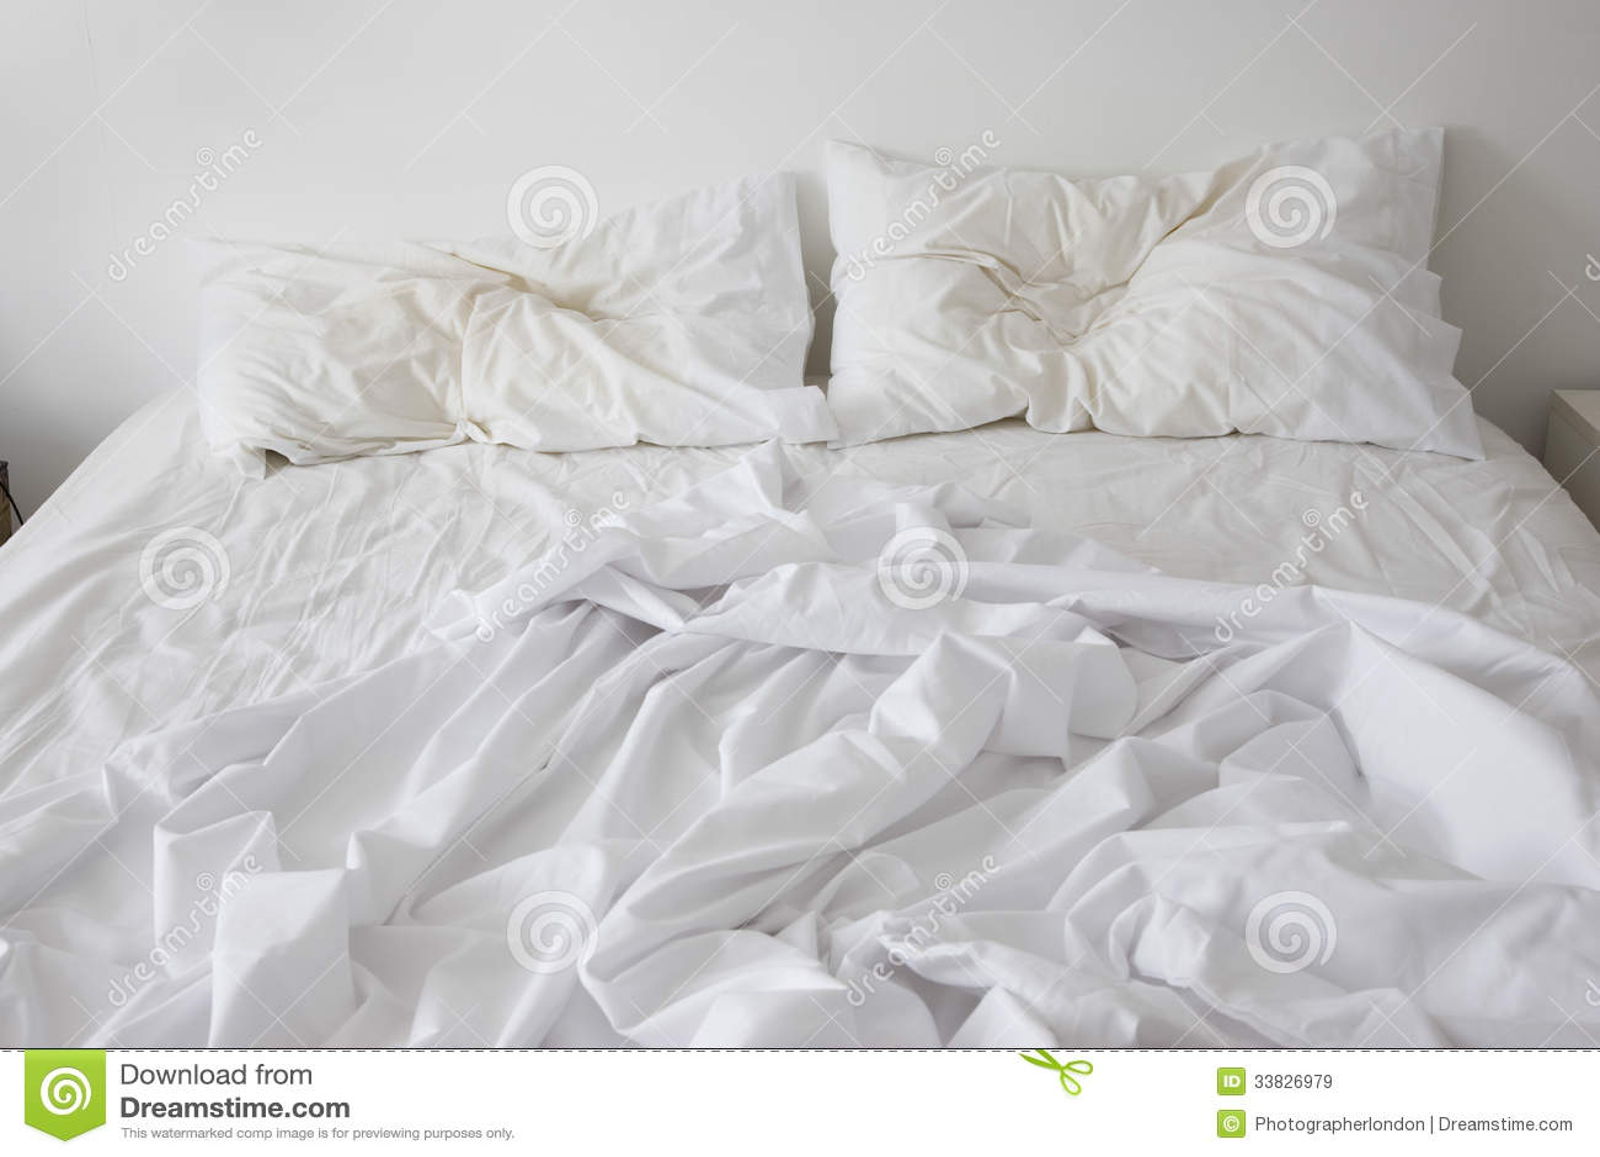 White Bed Sheet Photo Background